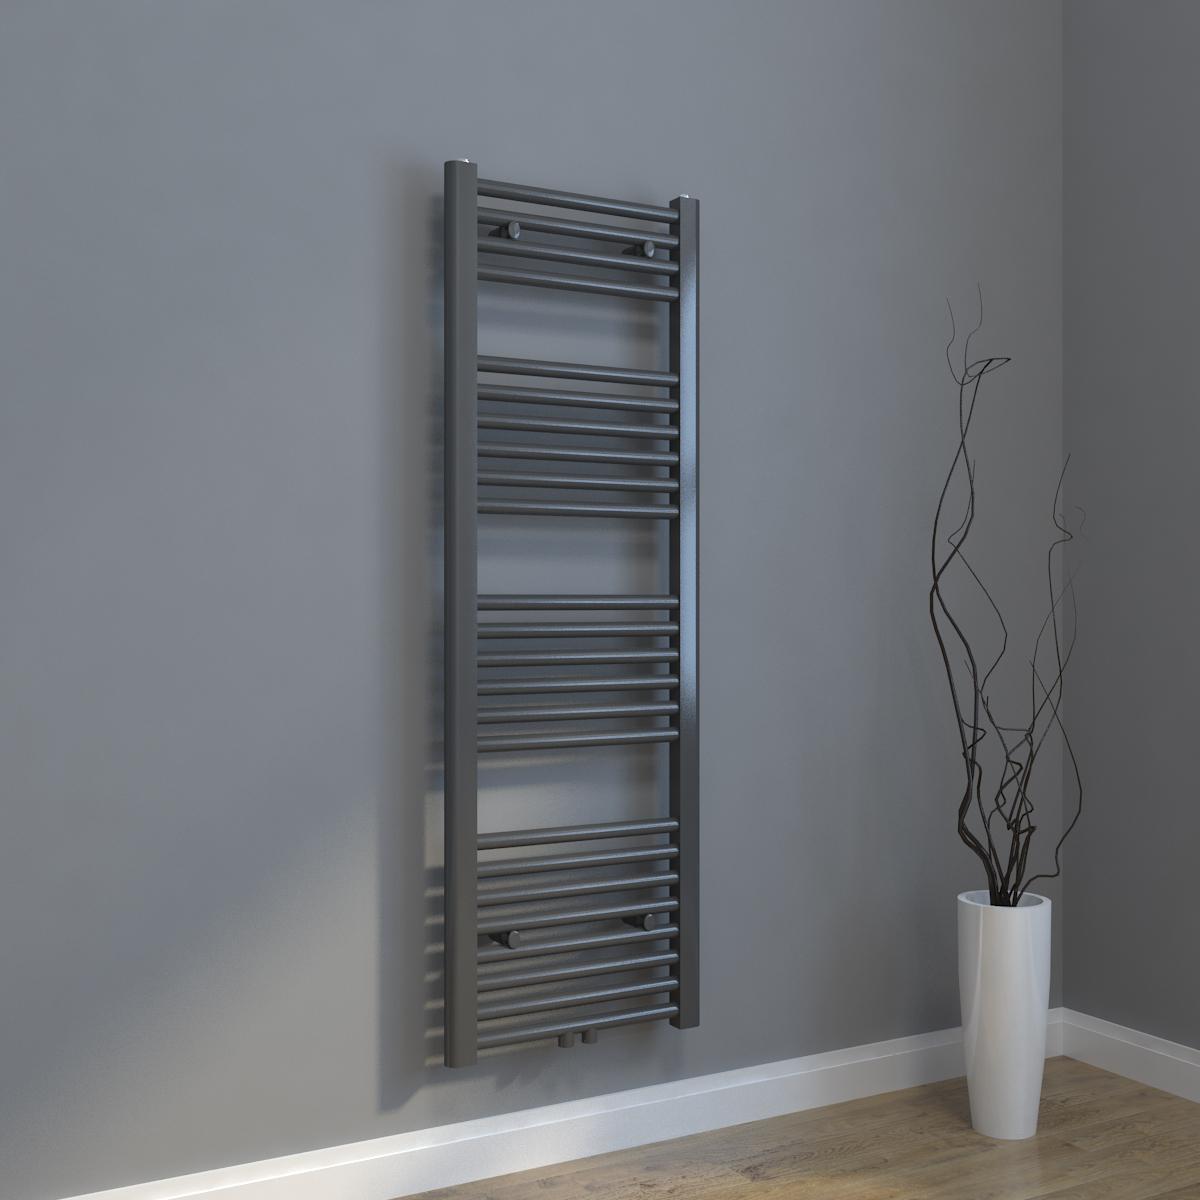 handtuchheizk rper handtuchw rmer handtuchheizung badheizk rper mittelanschlu ebay. Black Bedroom Furniture Sets. Home Design Ideas